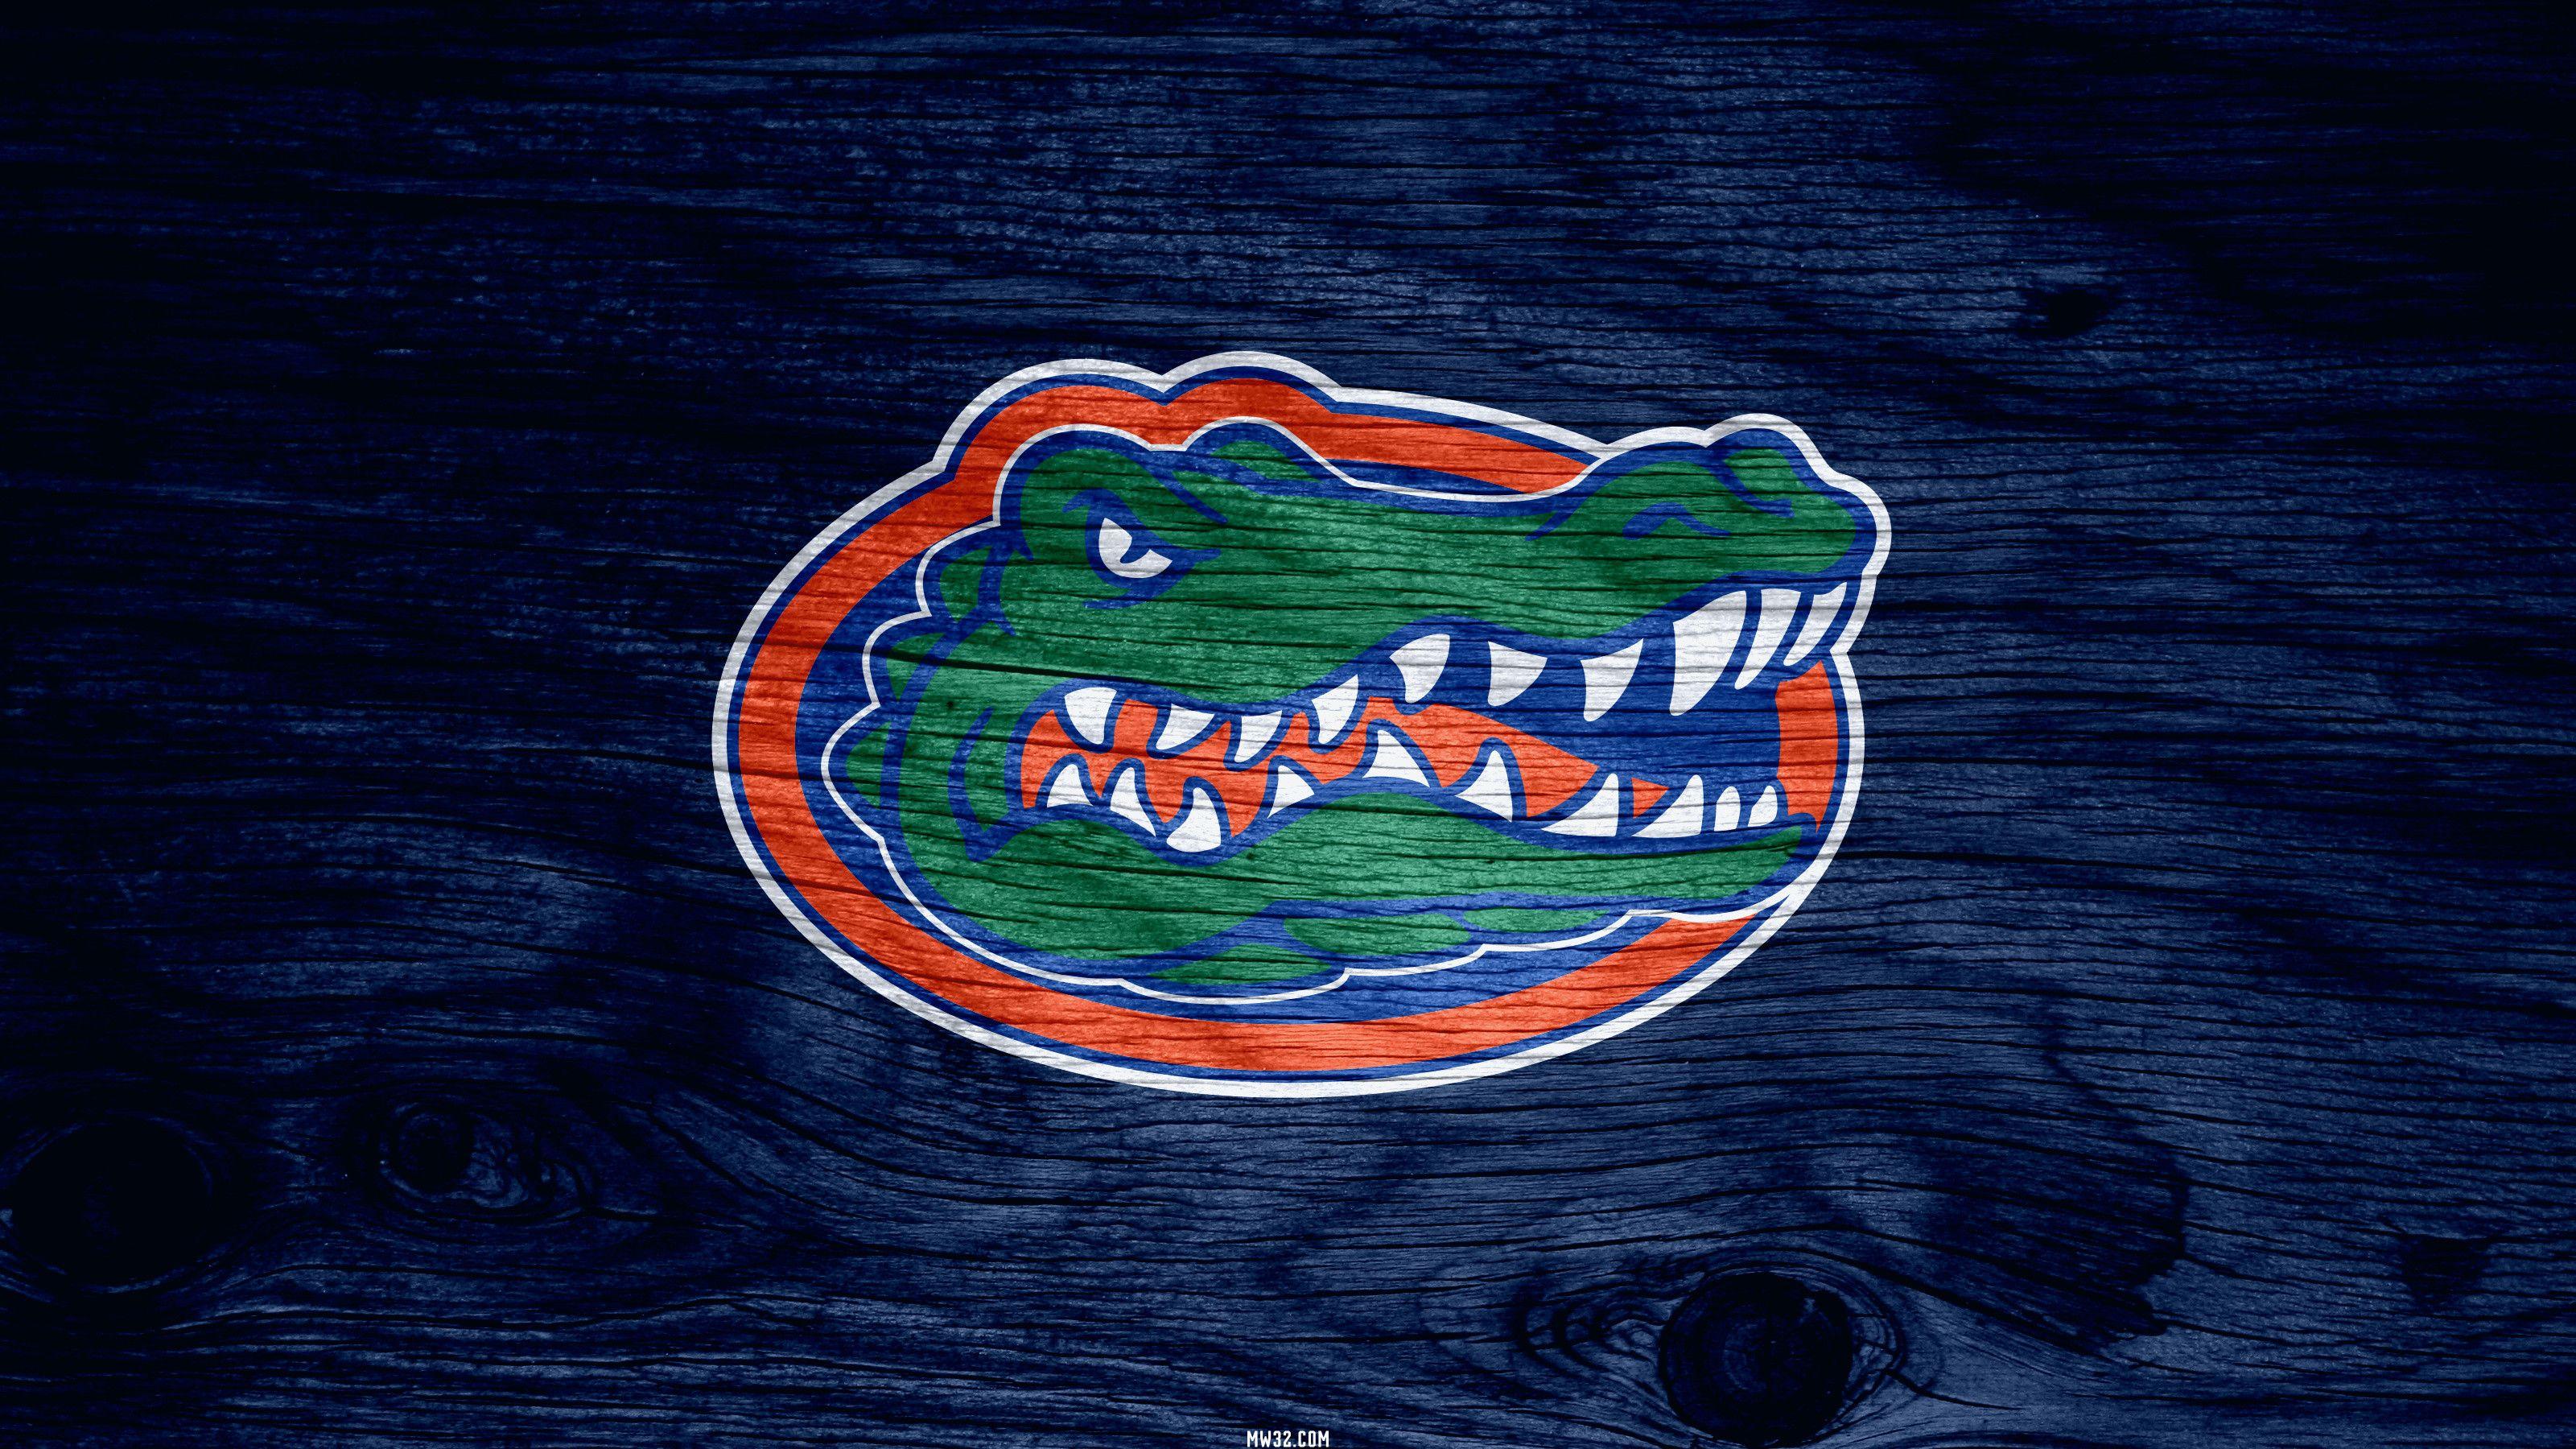 Florida Gator Screensavers And Wallpaper Florida Gators Wallpaper Florida Gators Gator